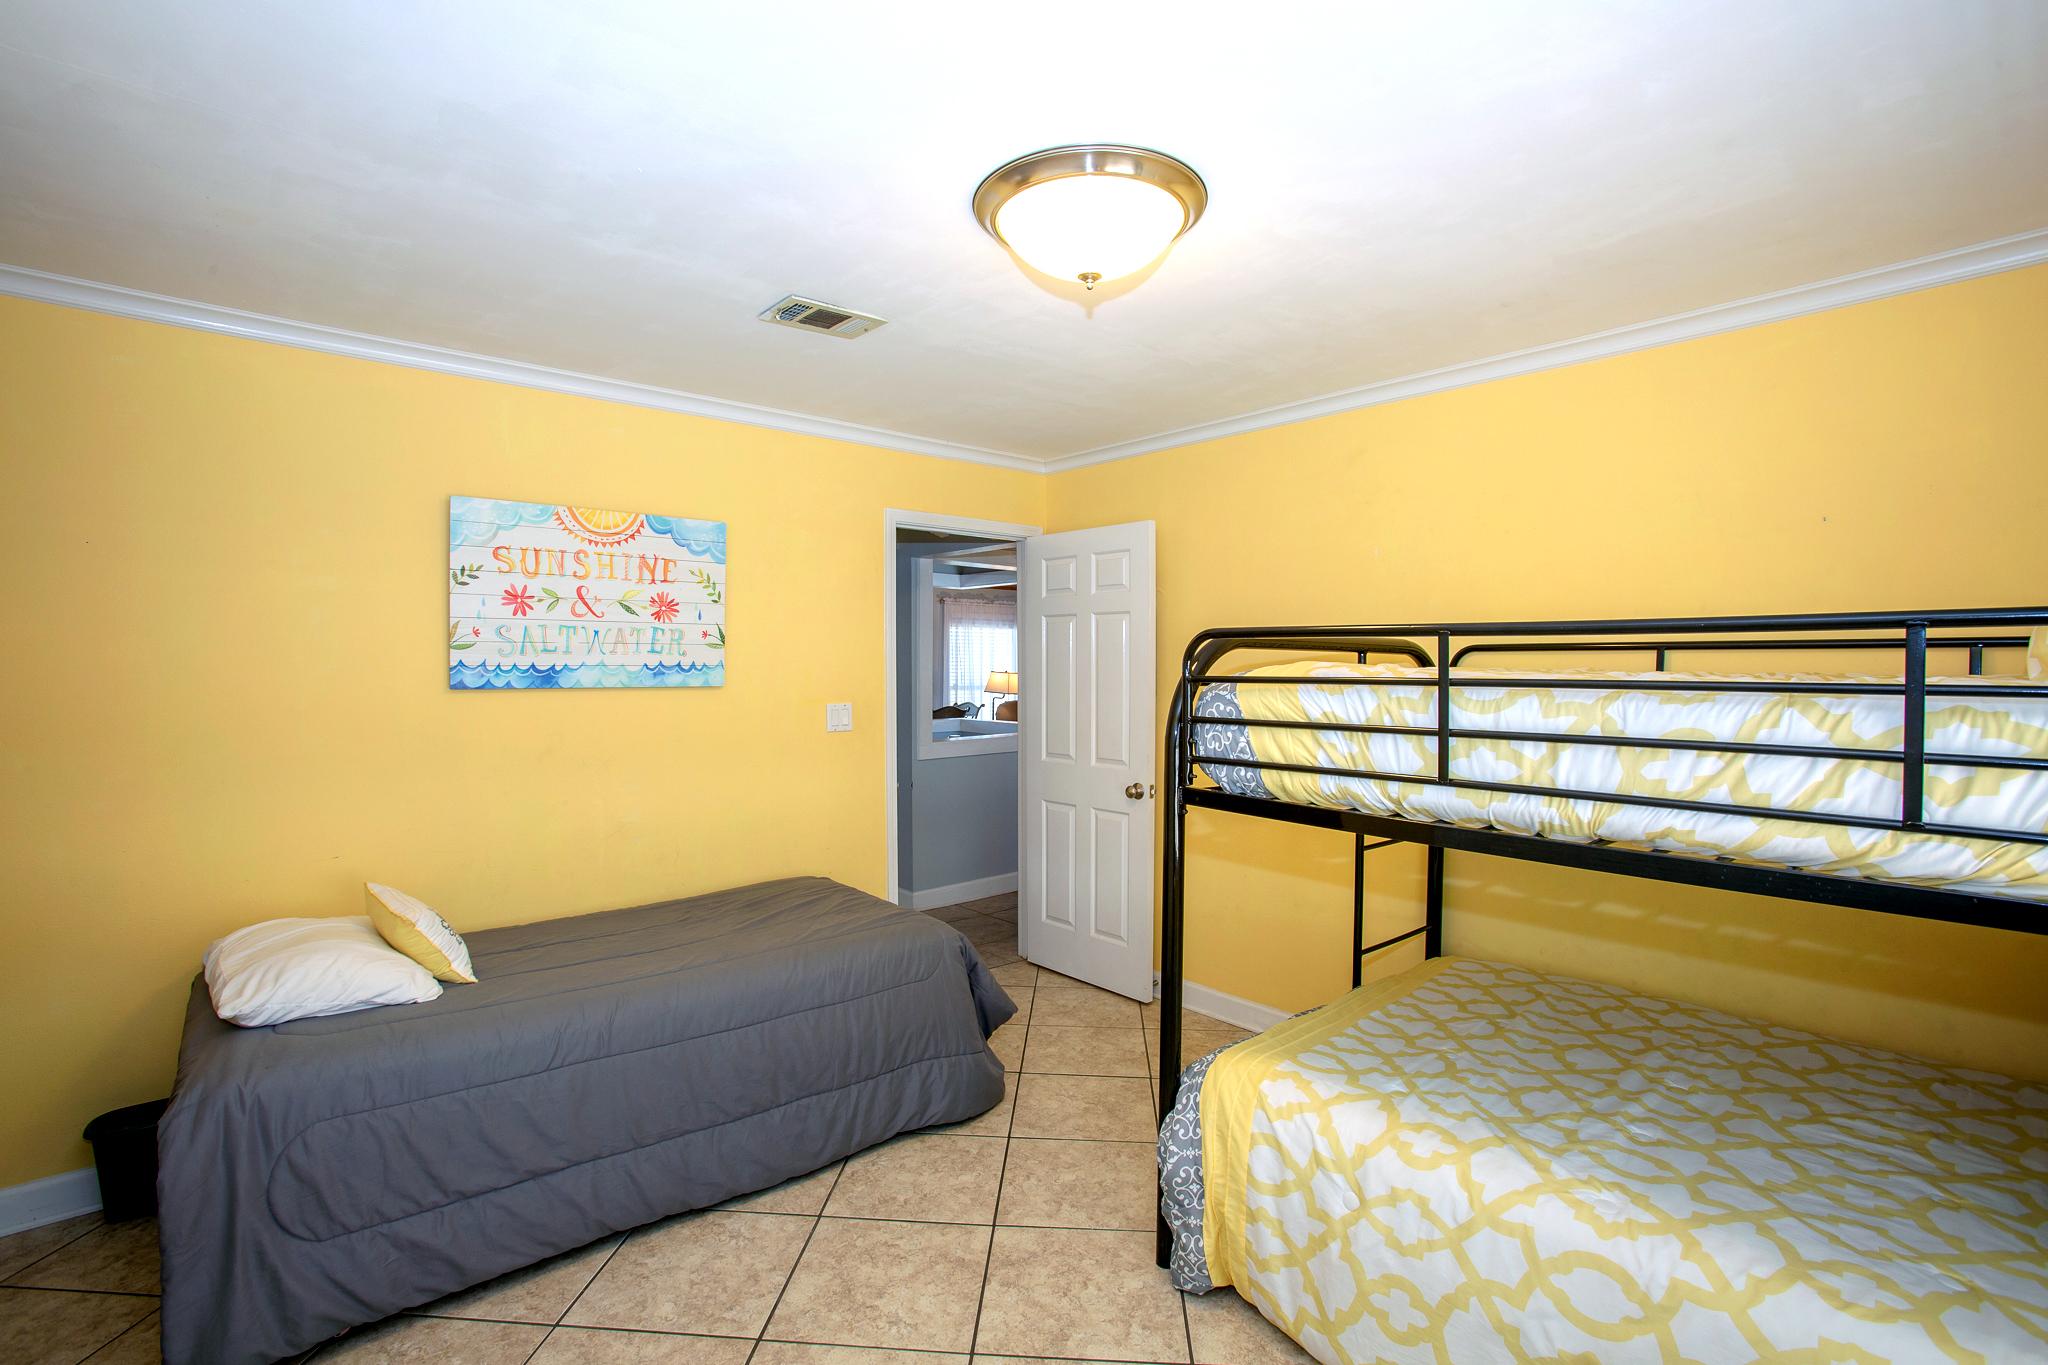 Maldonado 1015 - Sea the Big Picture House/Cottage rental in Pensacola Beach House Rentals in Pensacola Beach Florida - #15